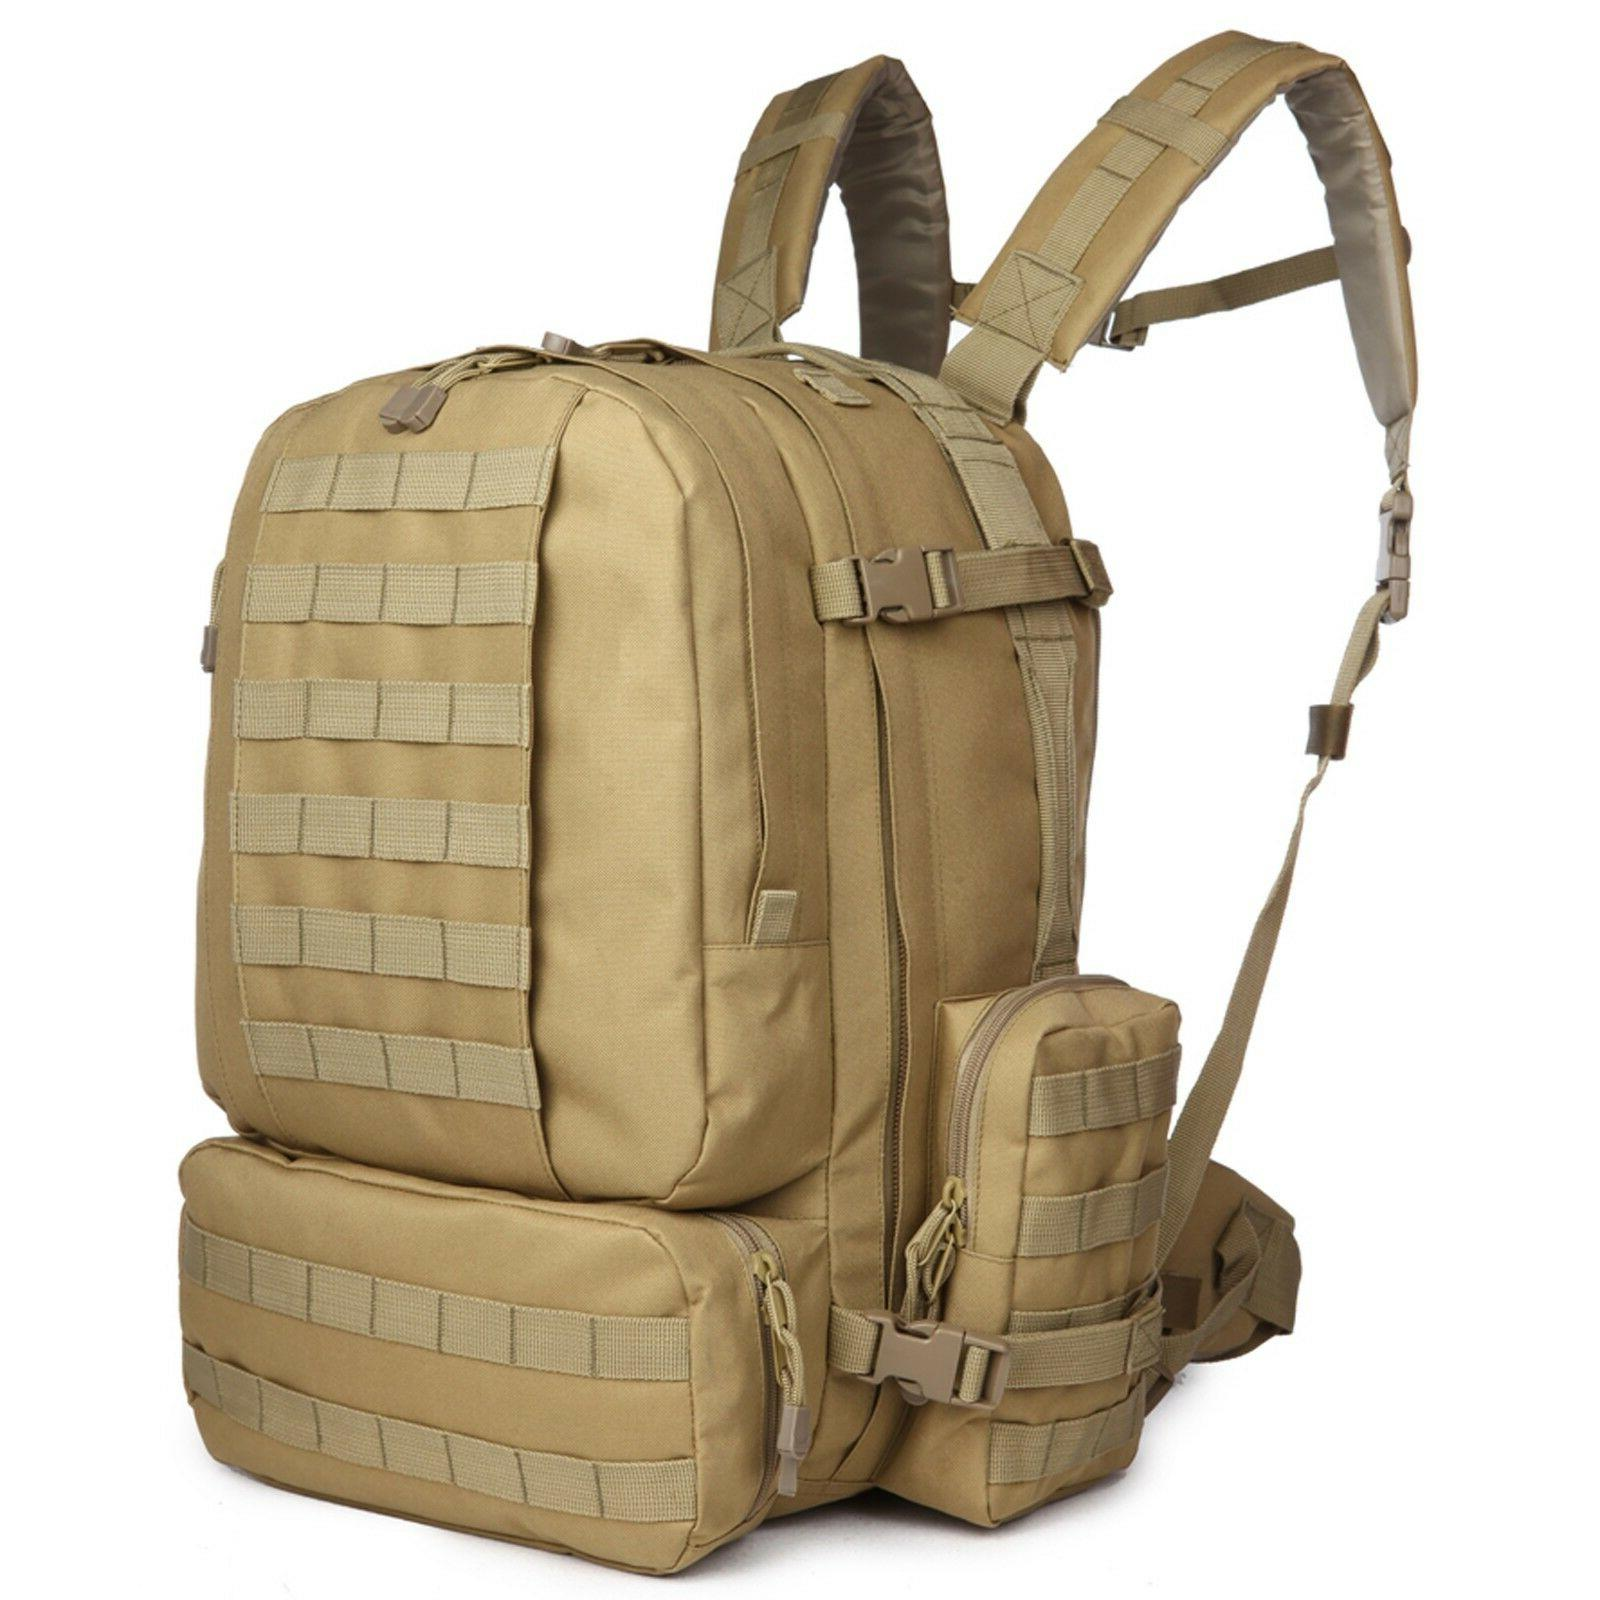 ARMYCAMOUSA  Military Rucksacks Tactical Molle Backpack Big